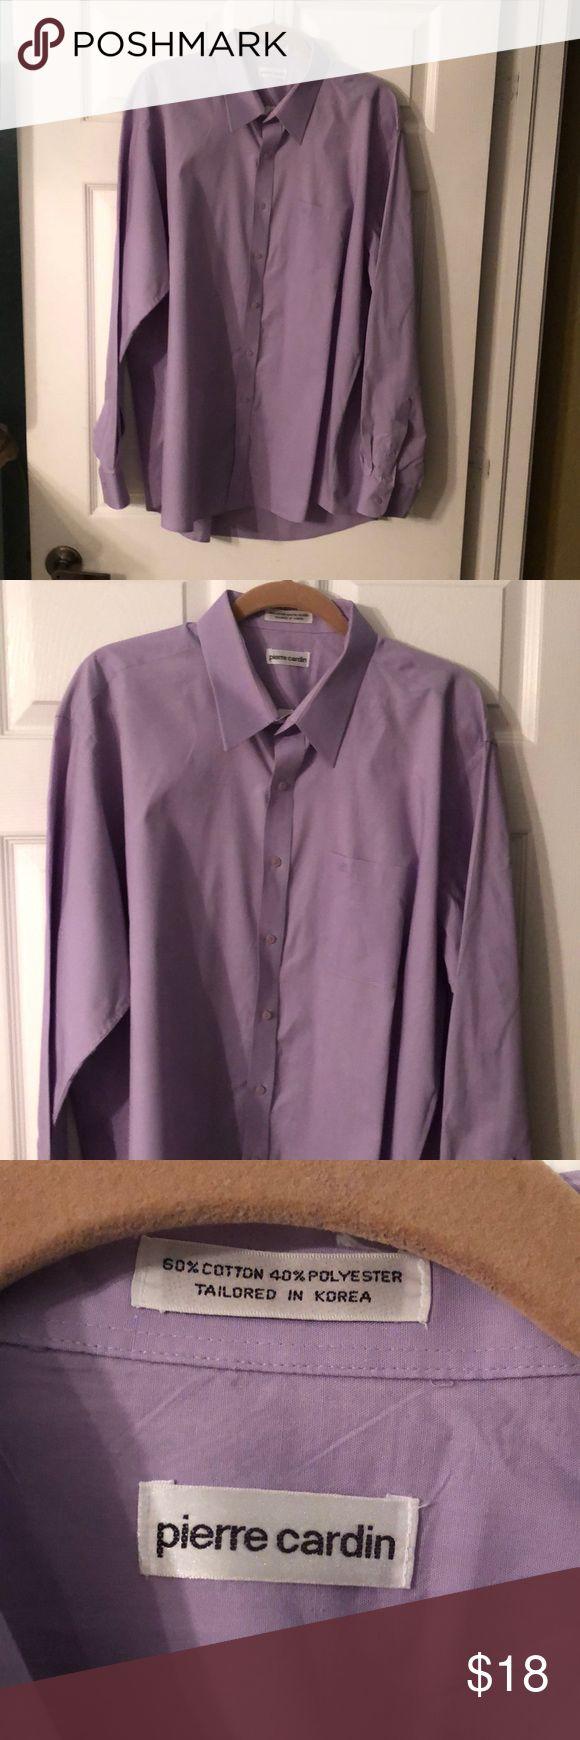 Vintage Pierre Cardin Shirt Beautiful pale lavender men's Pierre Cardin shirt in excellent condition. Pierre Cardin Shirts Casual Button Down Shirts